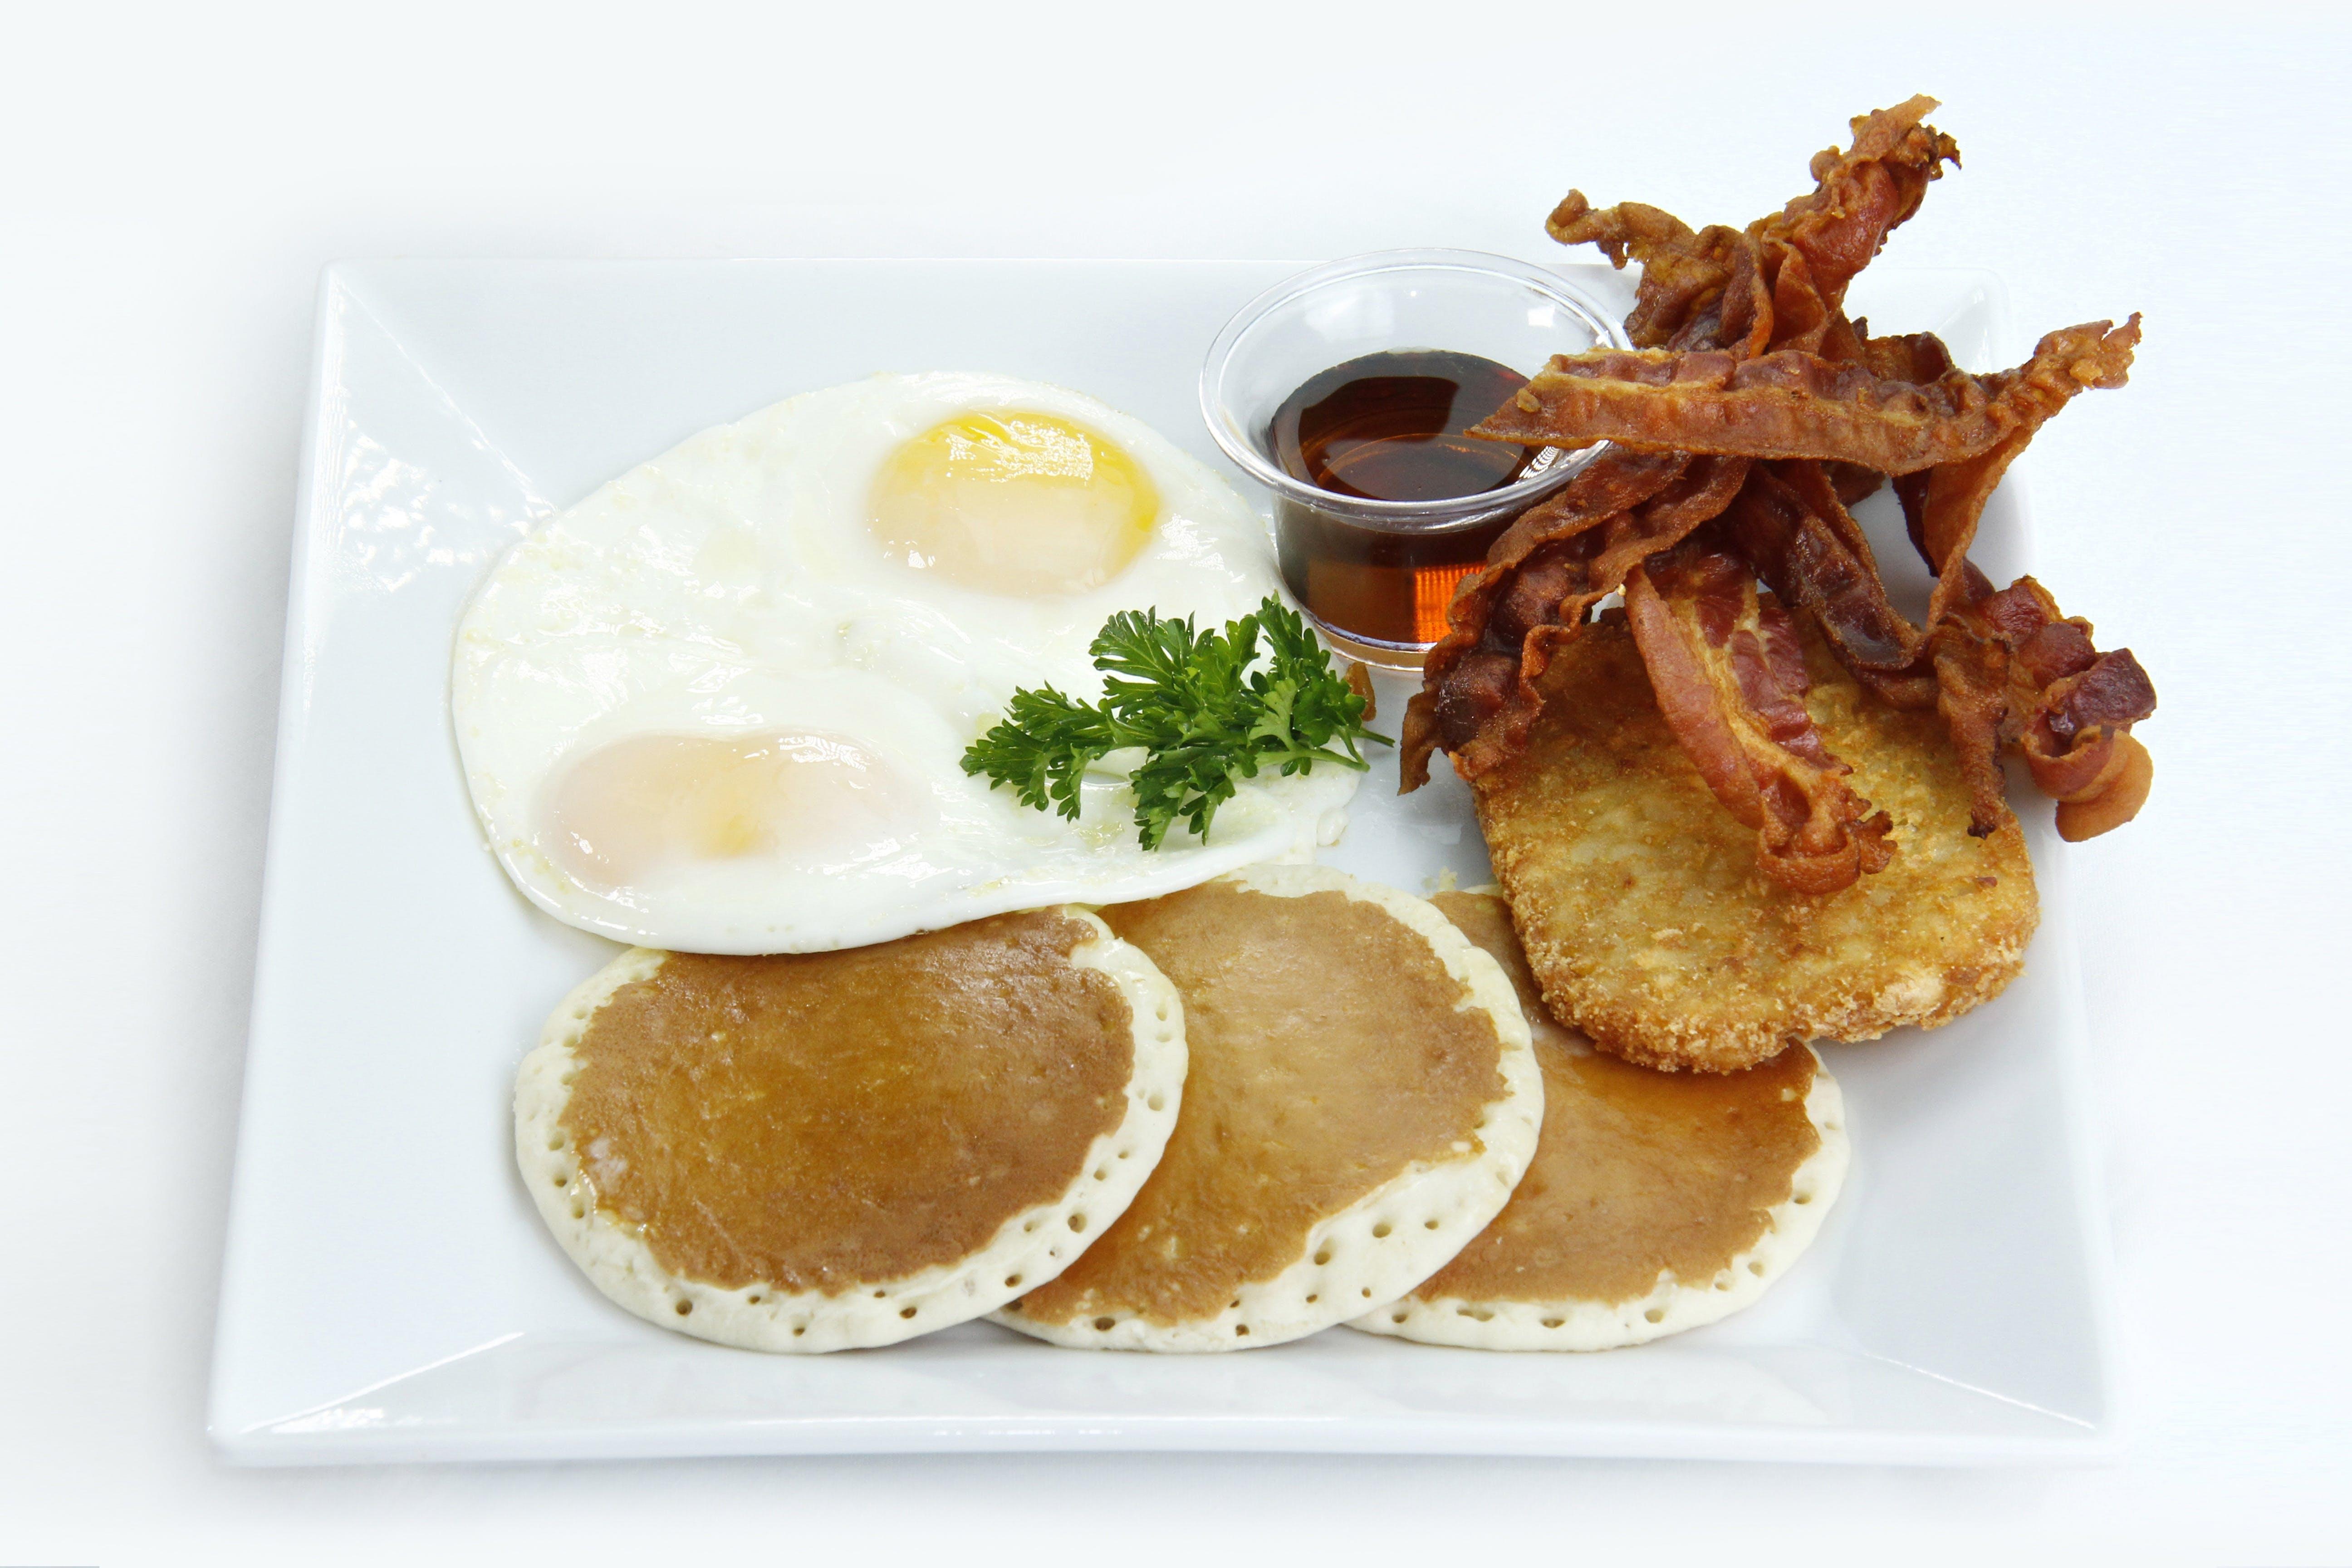 Free stock photo of food, café, breakfast, white